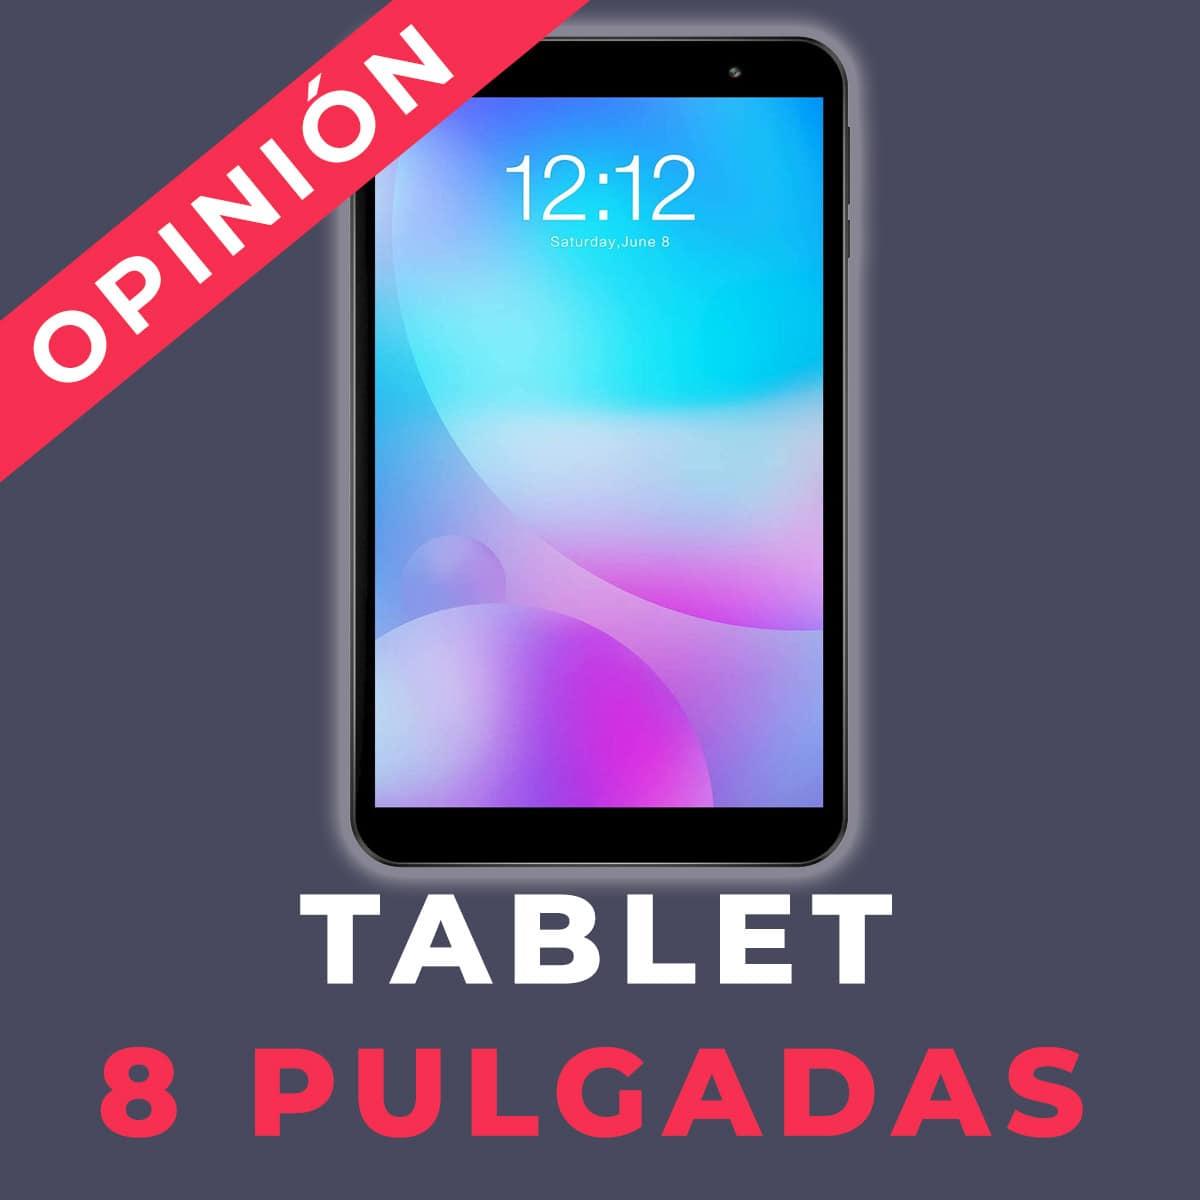 tablet 8 pulgadas